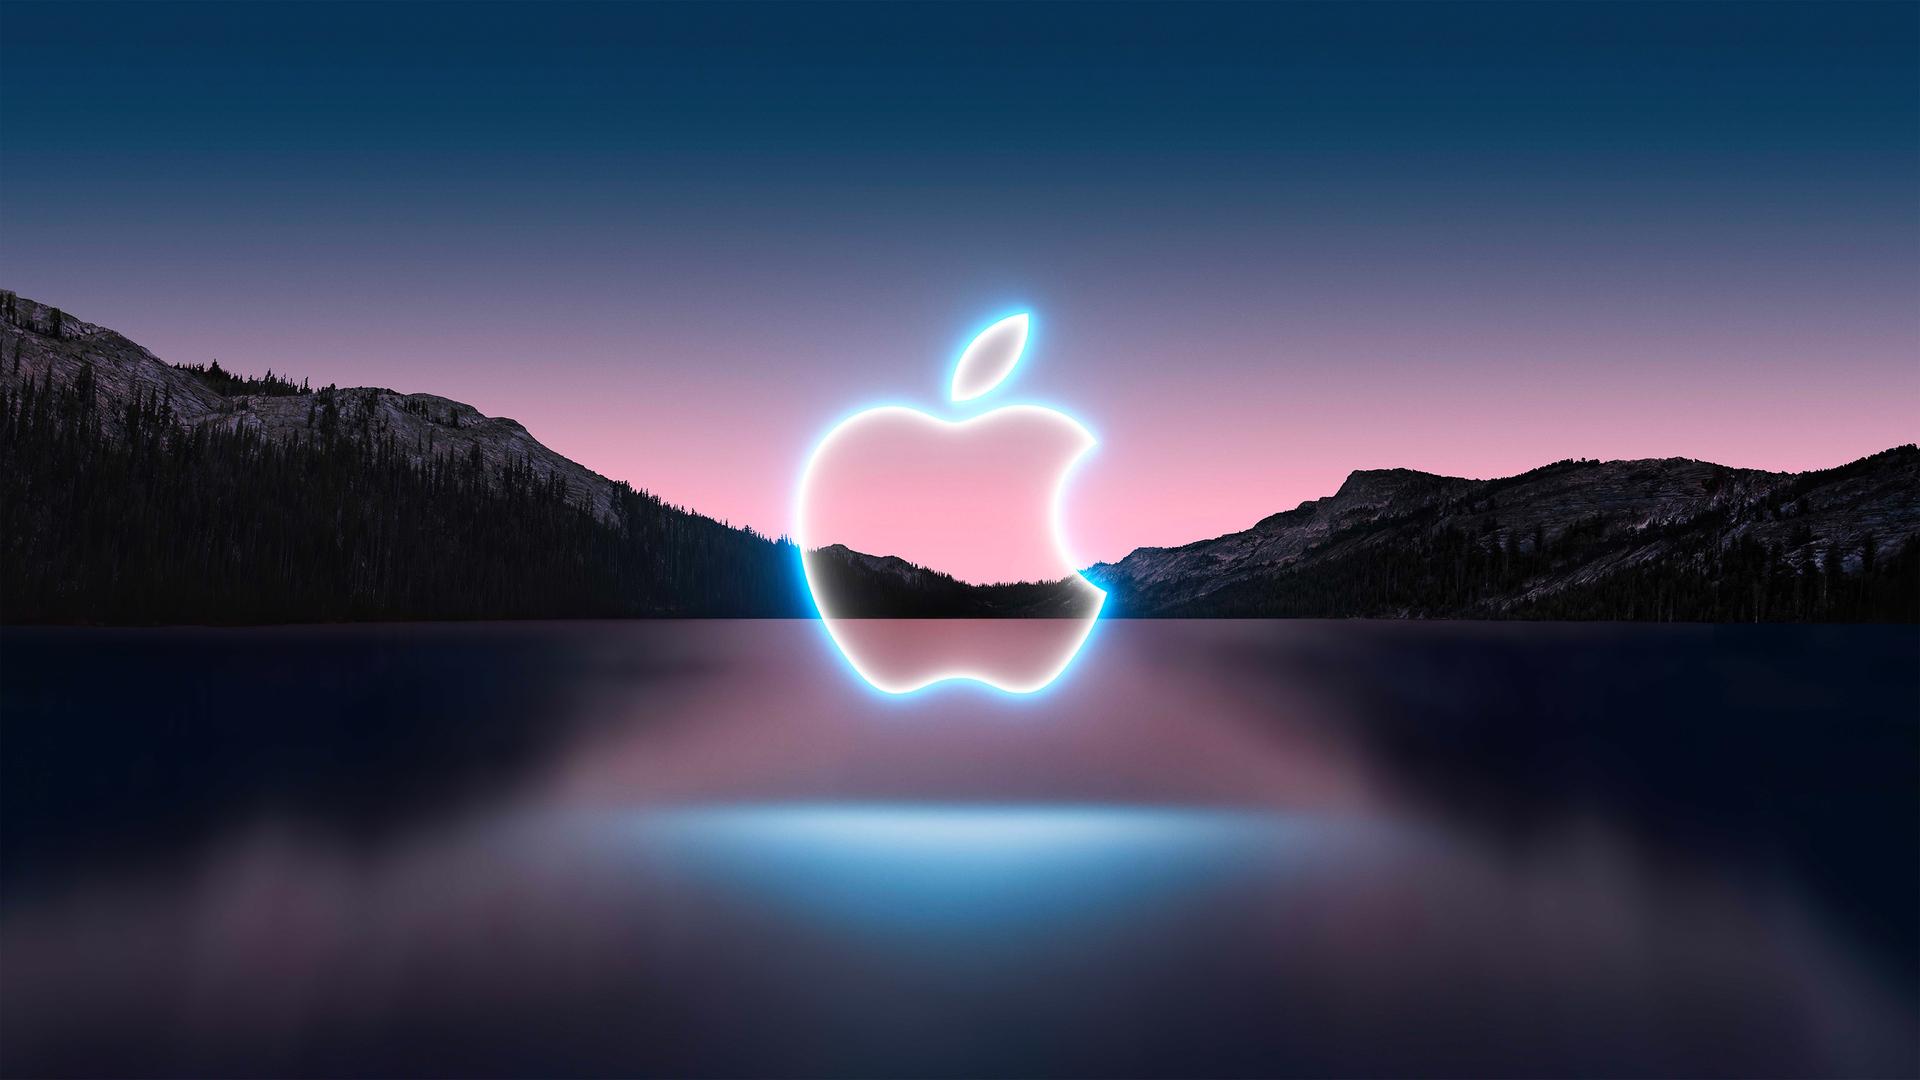 apple-event-2021-background-34.jpg